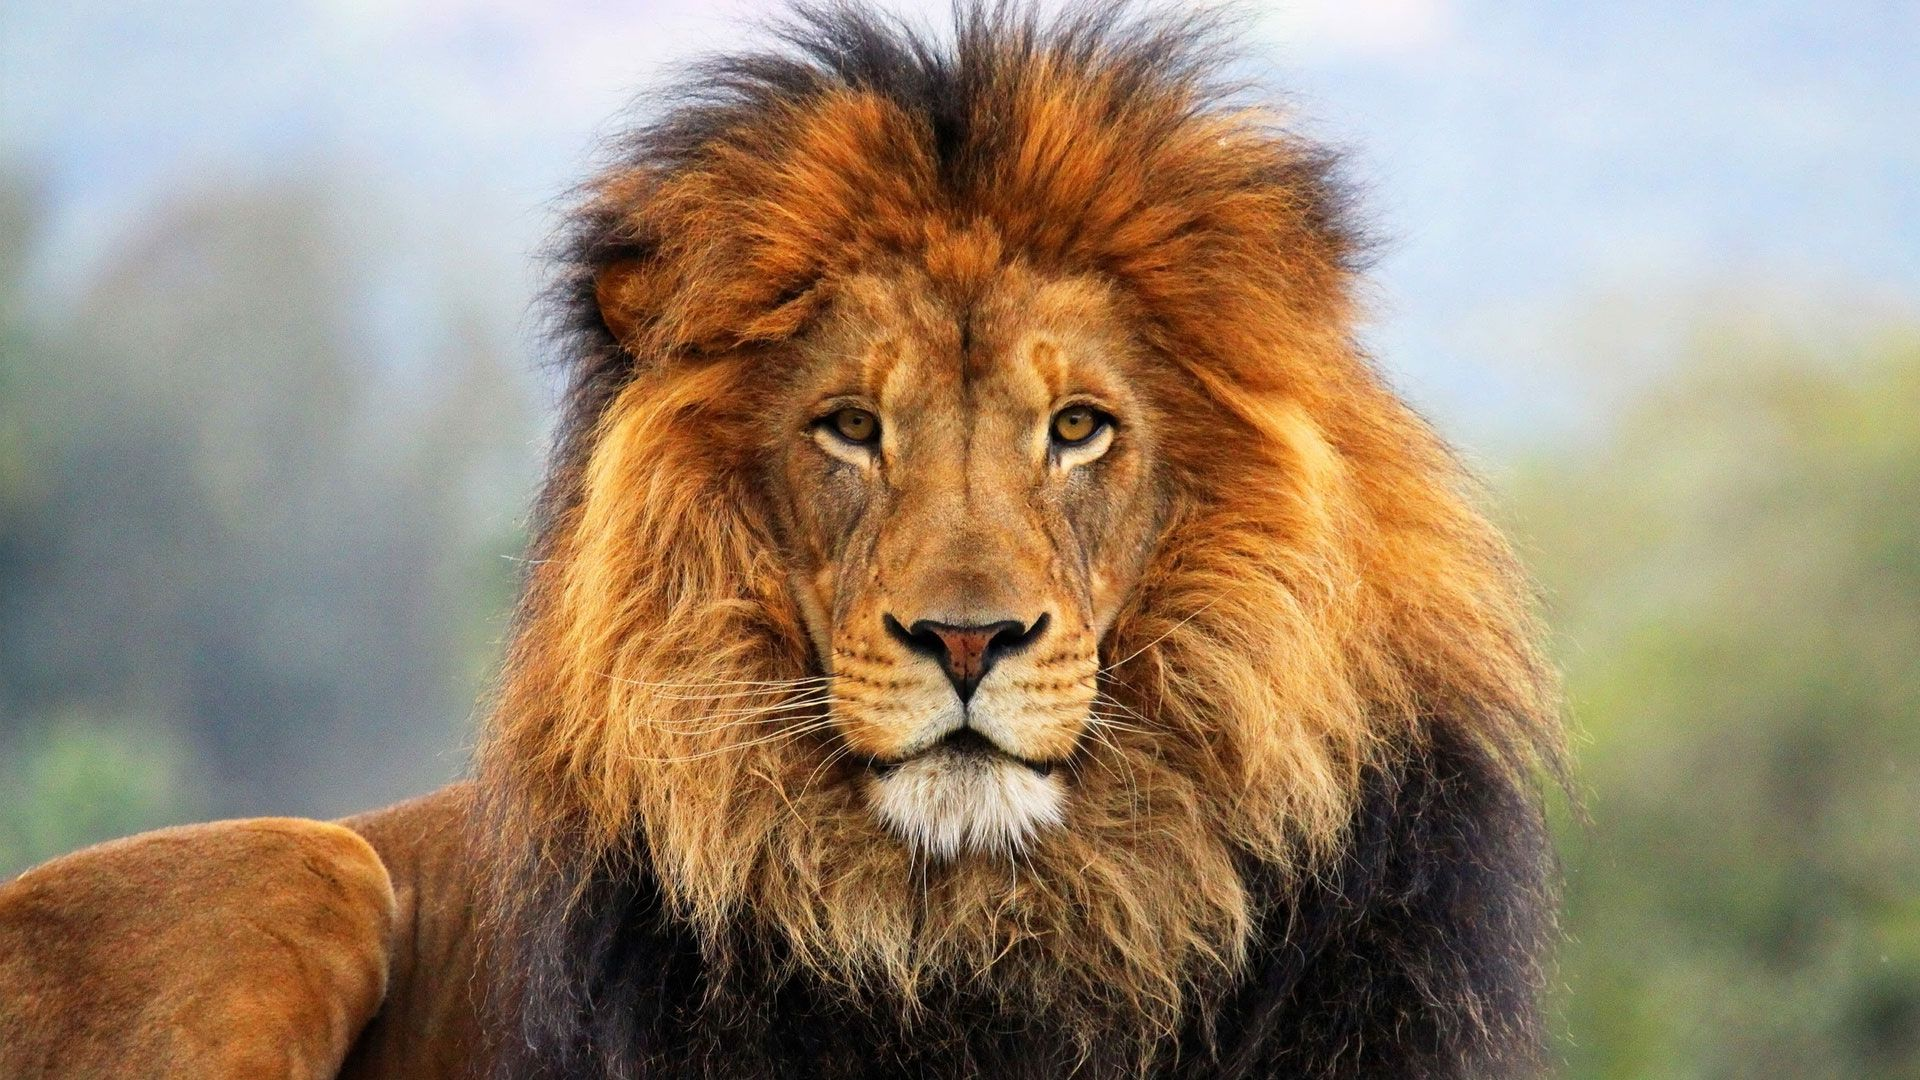 lion wallpaper hd 1080p - Free Large Images | Clipart ...